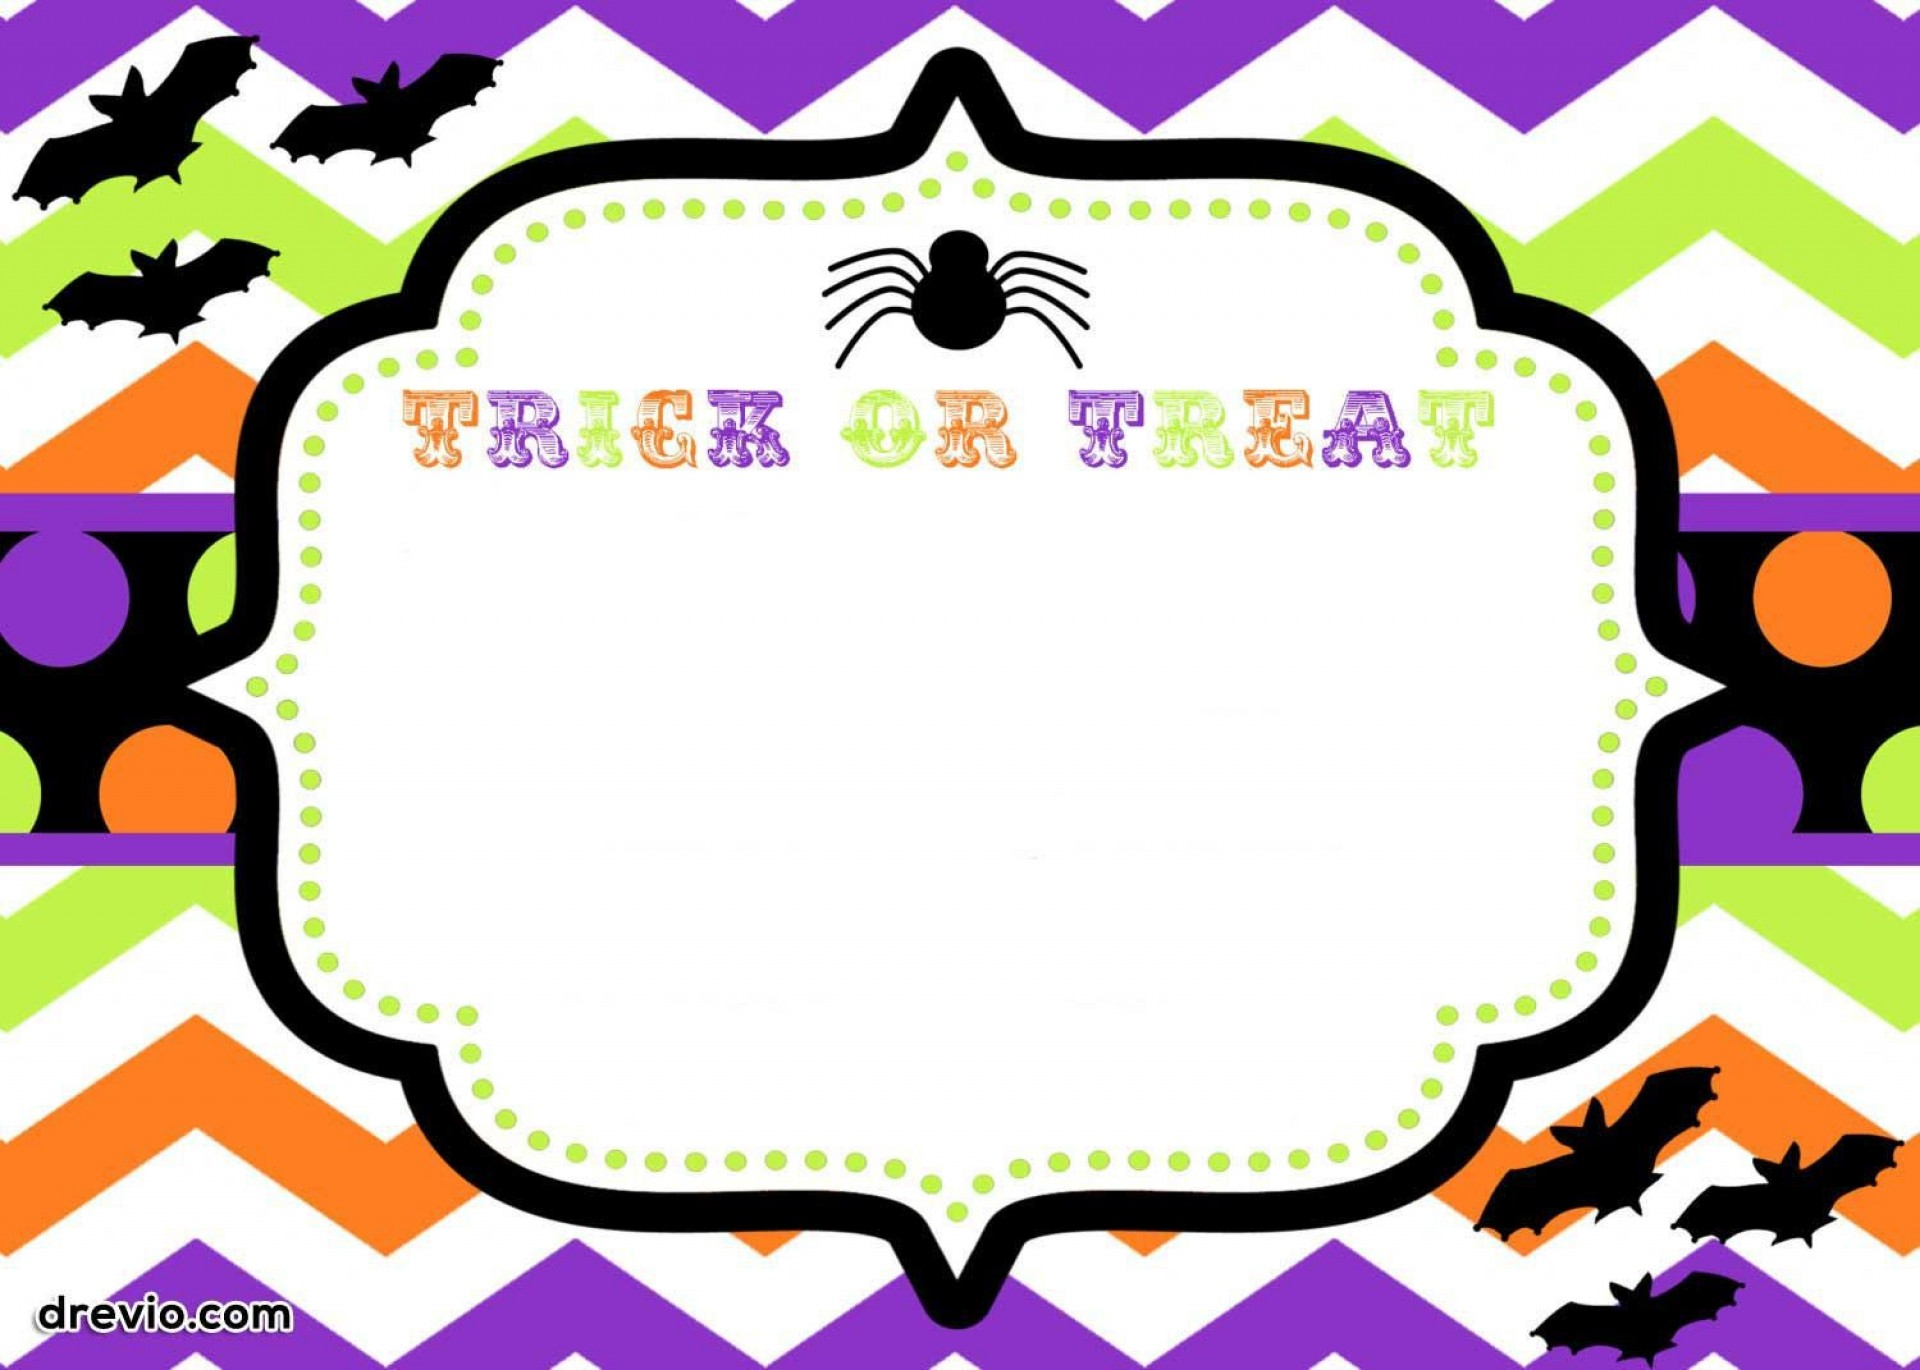 008 Phenomenal Free Halloween Invitation Template Inspiration  Templates Online Printable Birthday Party Wedding1920